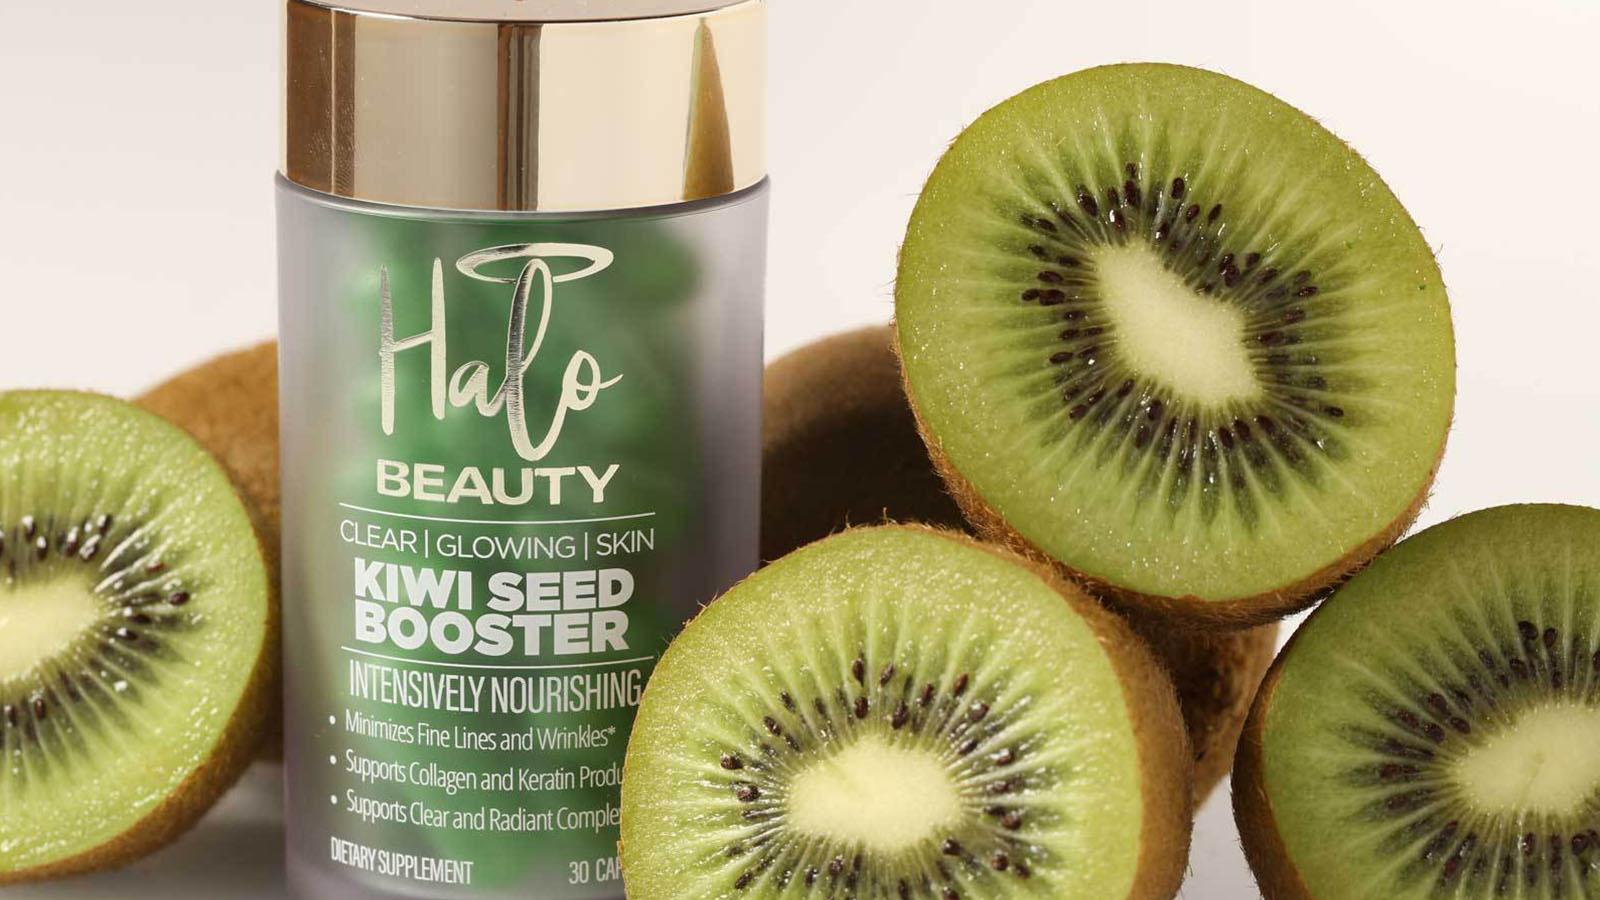 Halo Beauty Kiwi Seed Booster